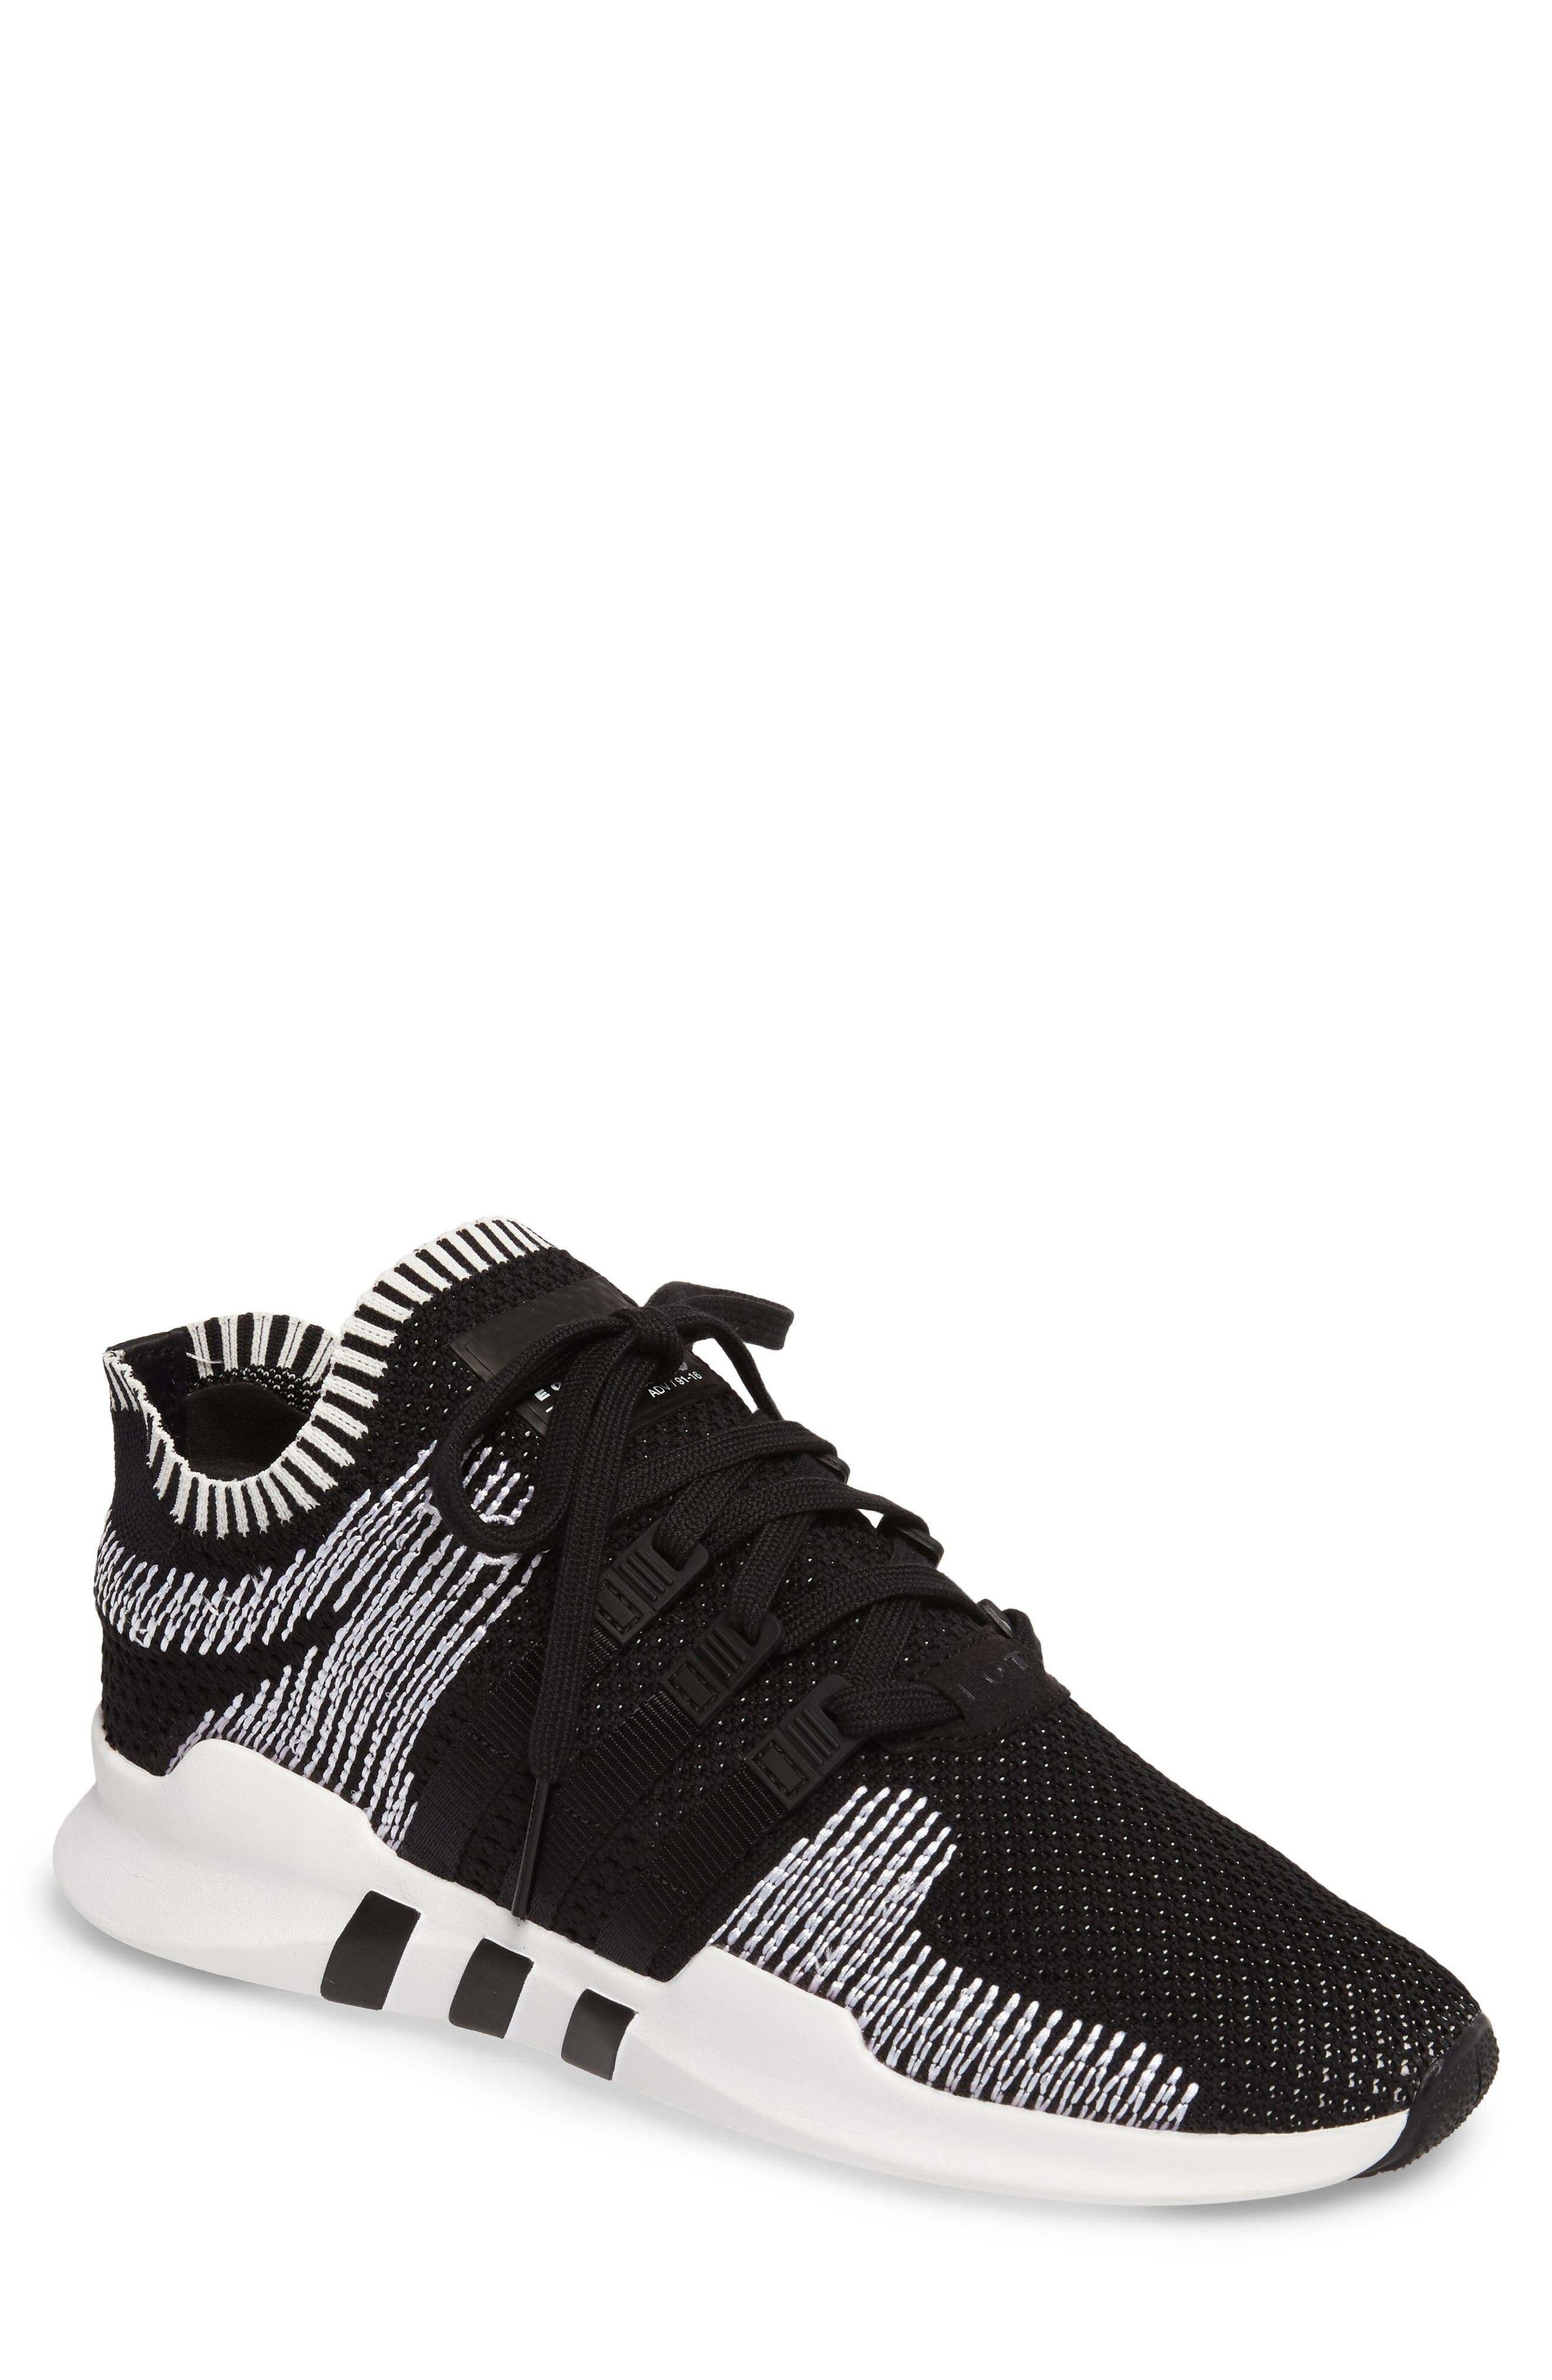 adidas EQT Support ADV PrimeKnit Sneaker (Men)